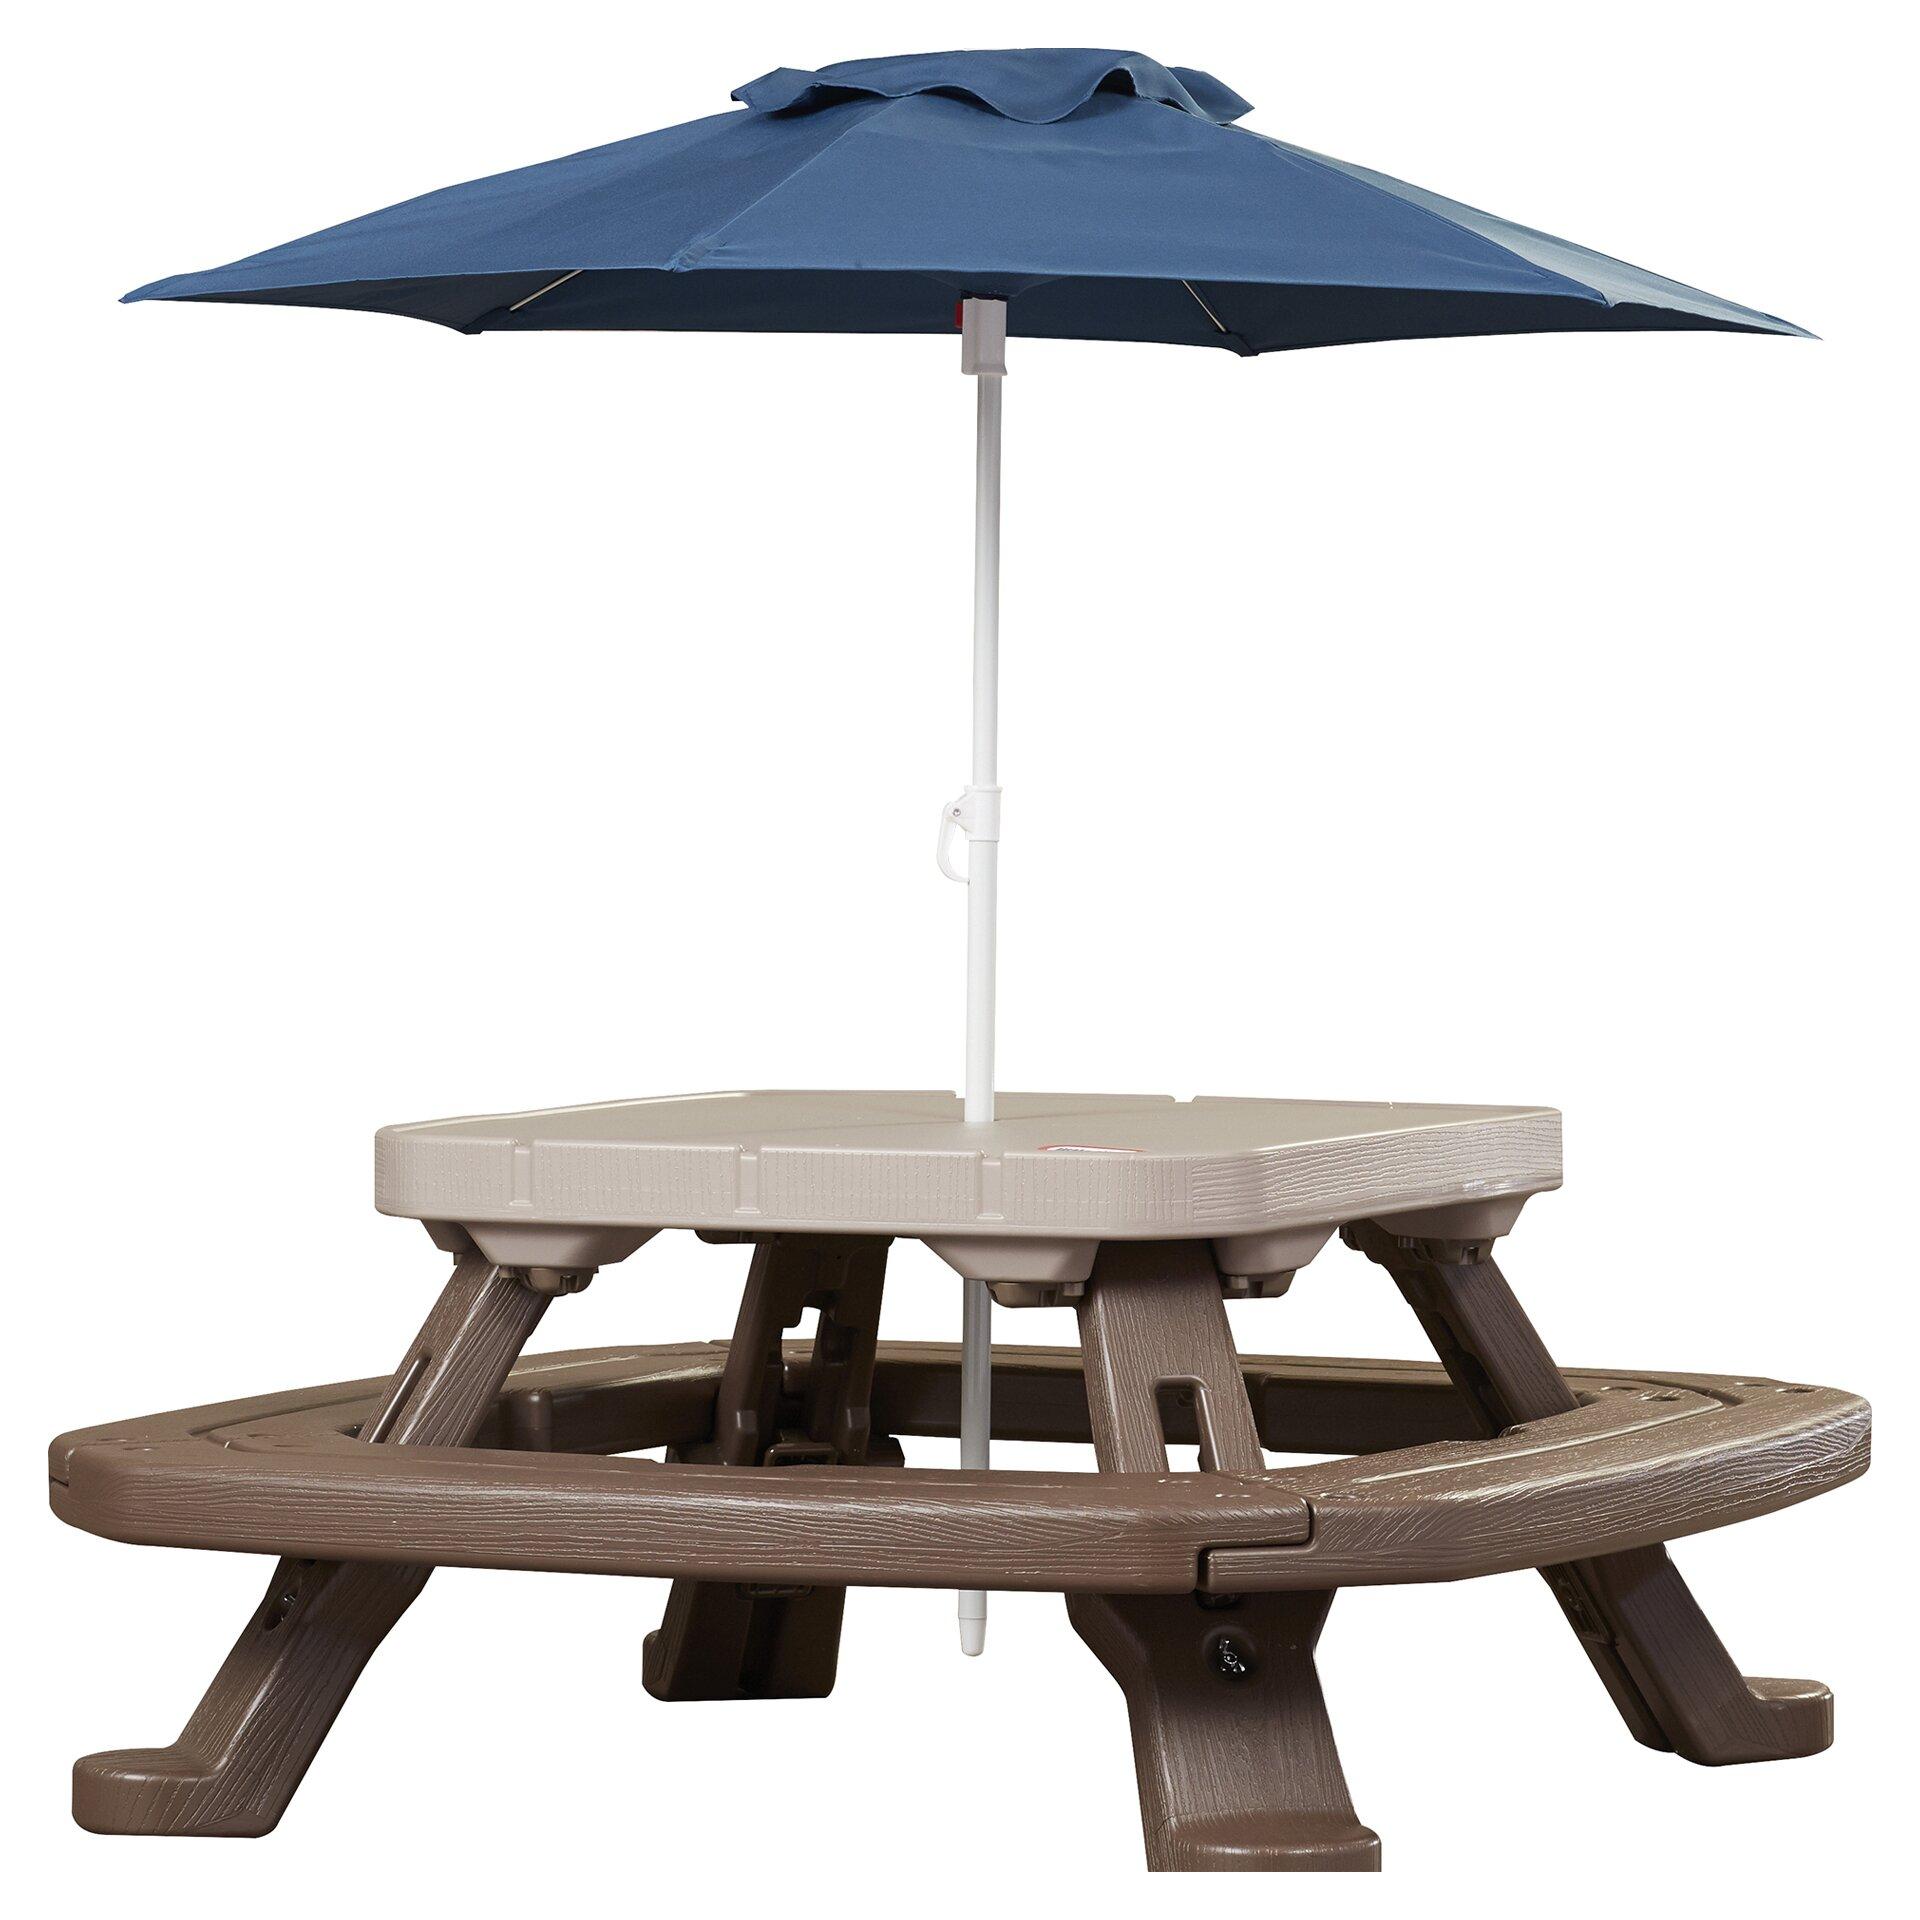 Little Tikes Endless Adventures Fold 'n Store Umbrella